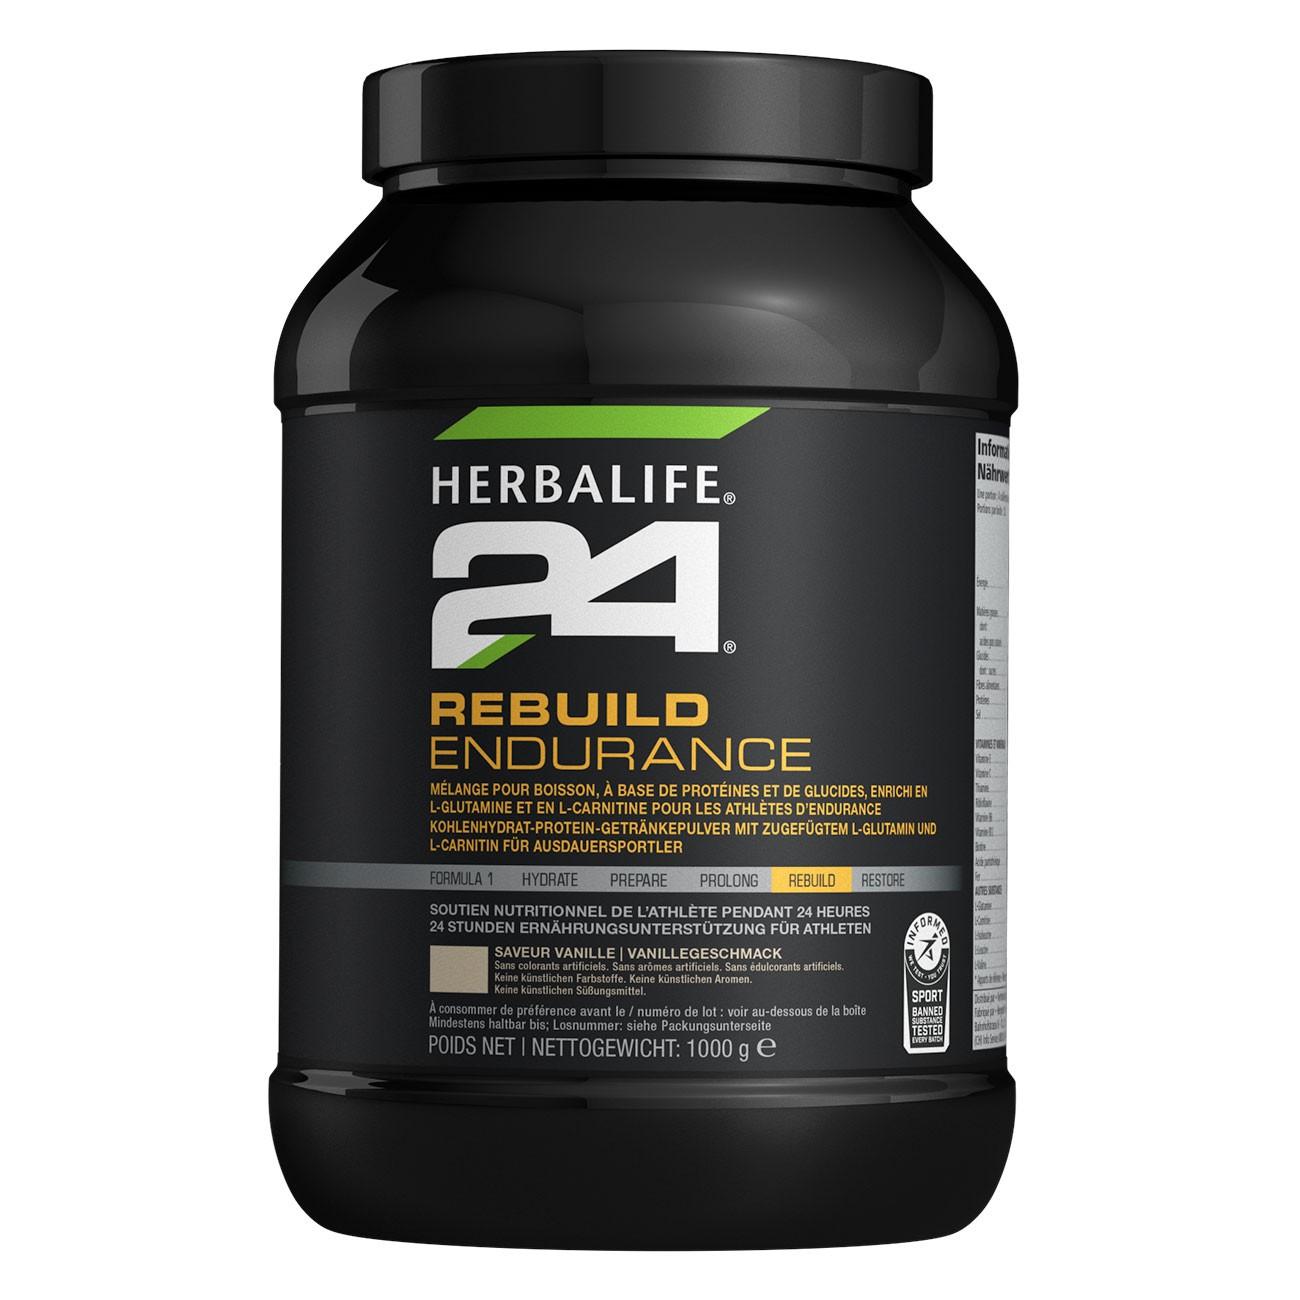 Herbalife H24 Rebuild Endurance 1000g